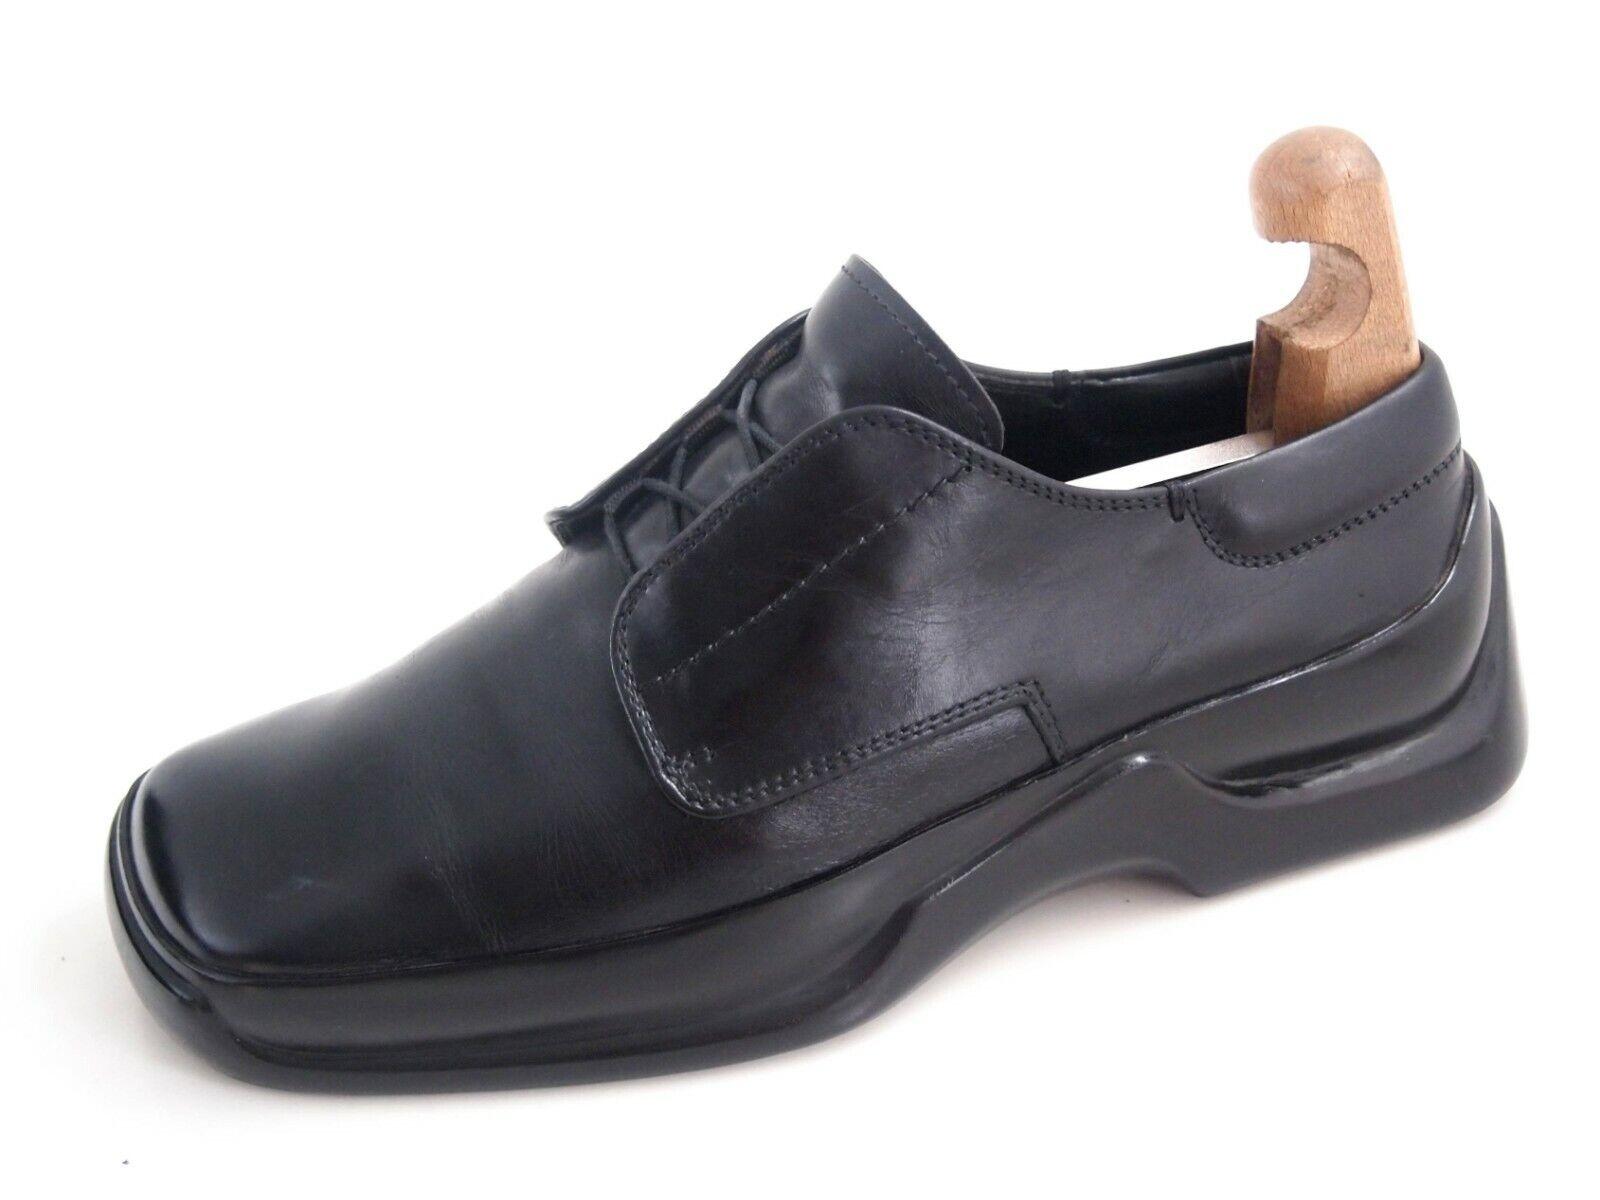 Prada Chunky Sole Derby Oxfords nero Leather Mens scarpe Dimensione US 8.5 EU 41.5  650